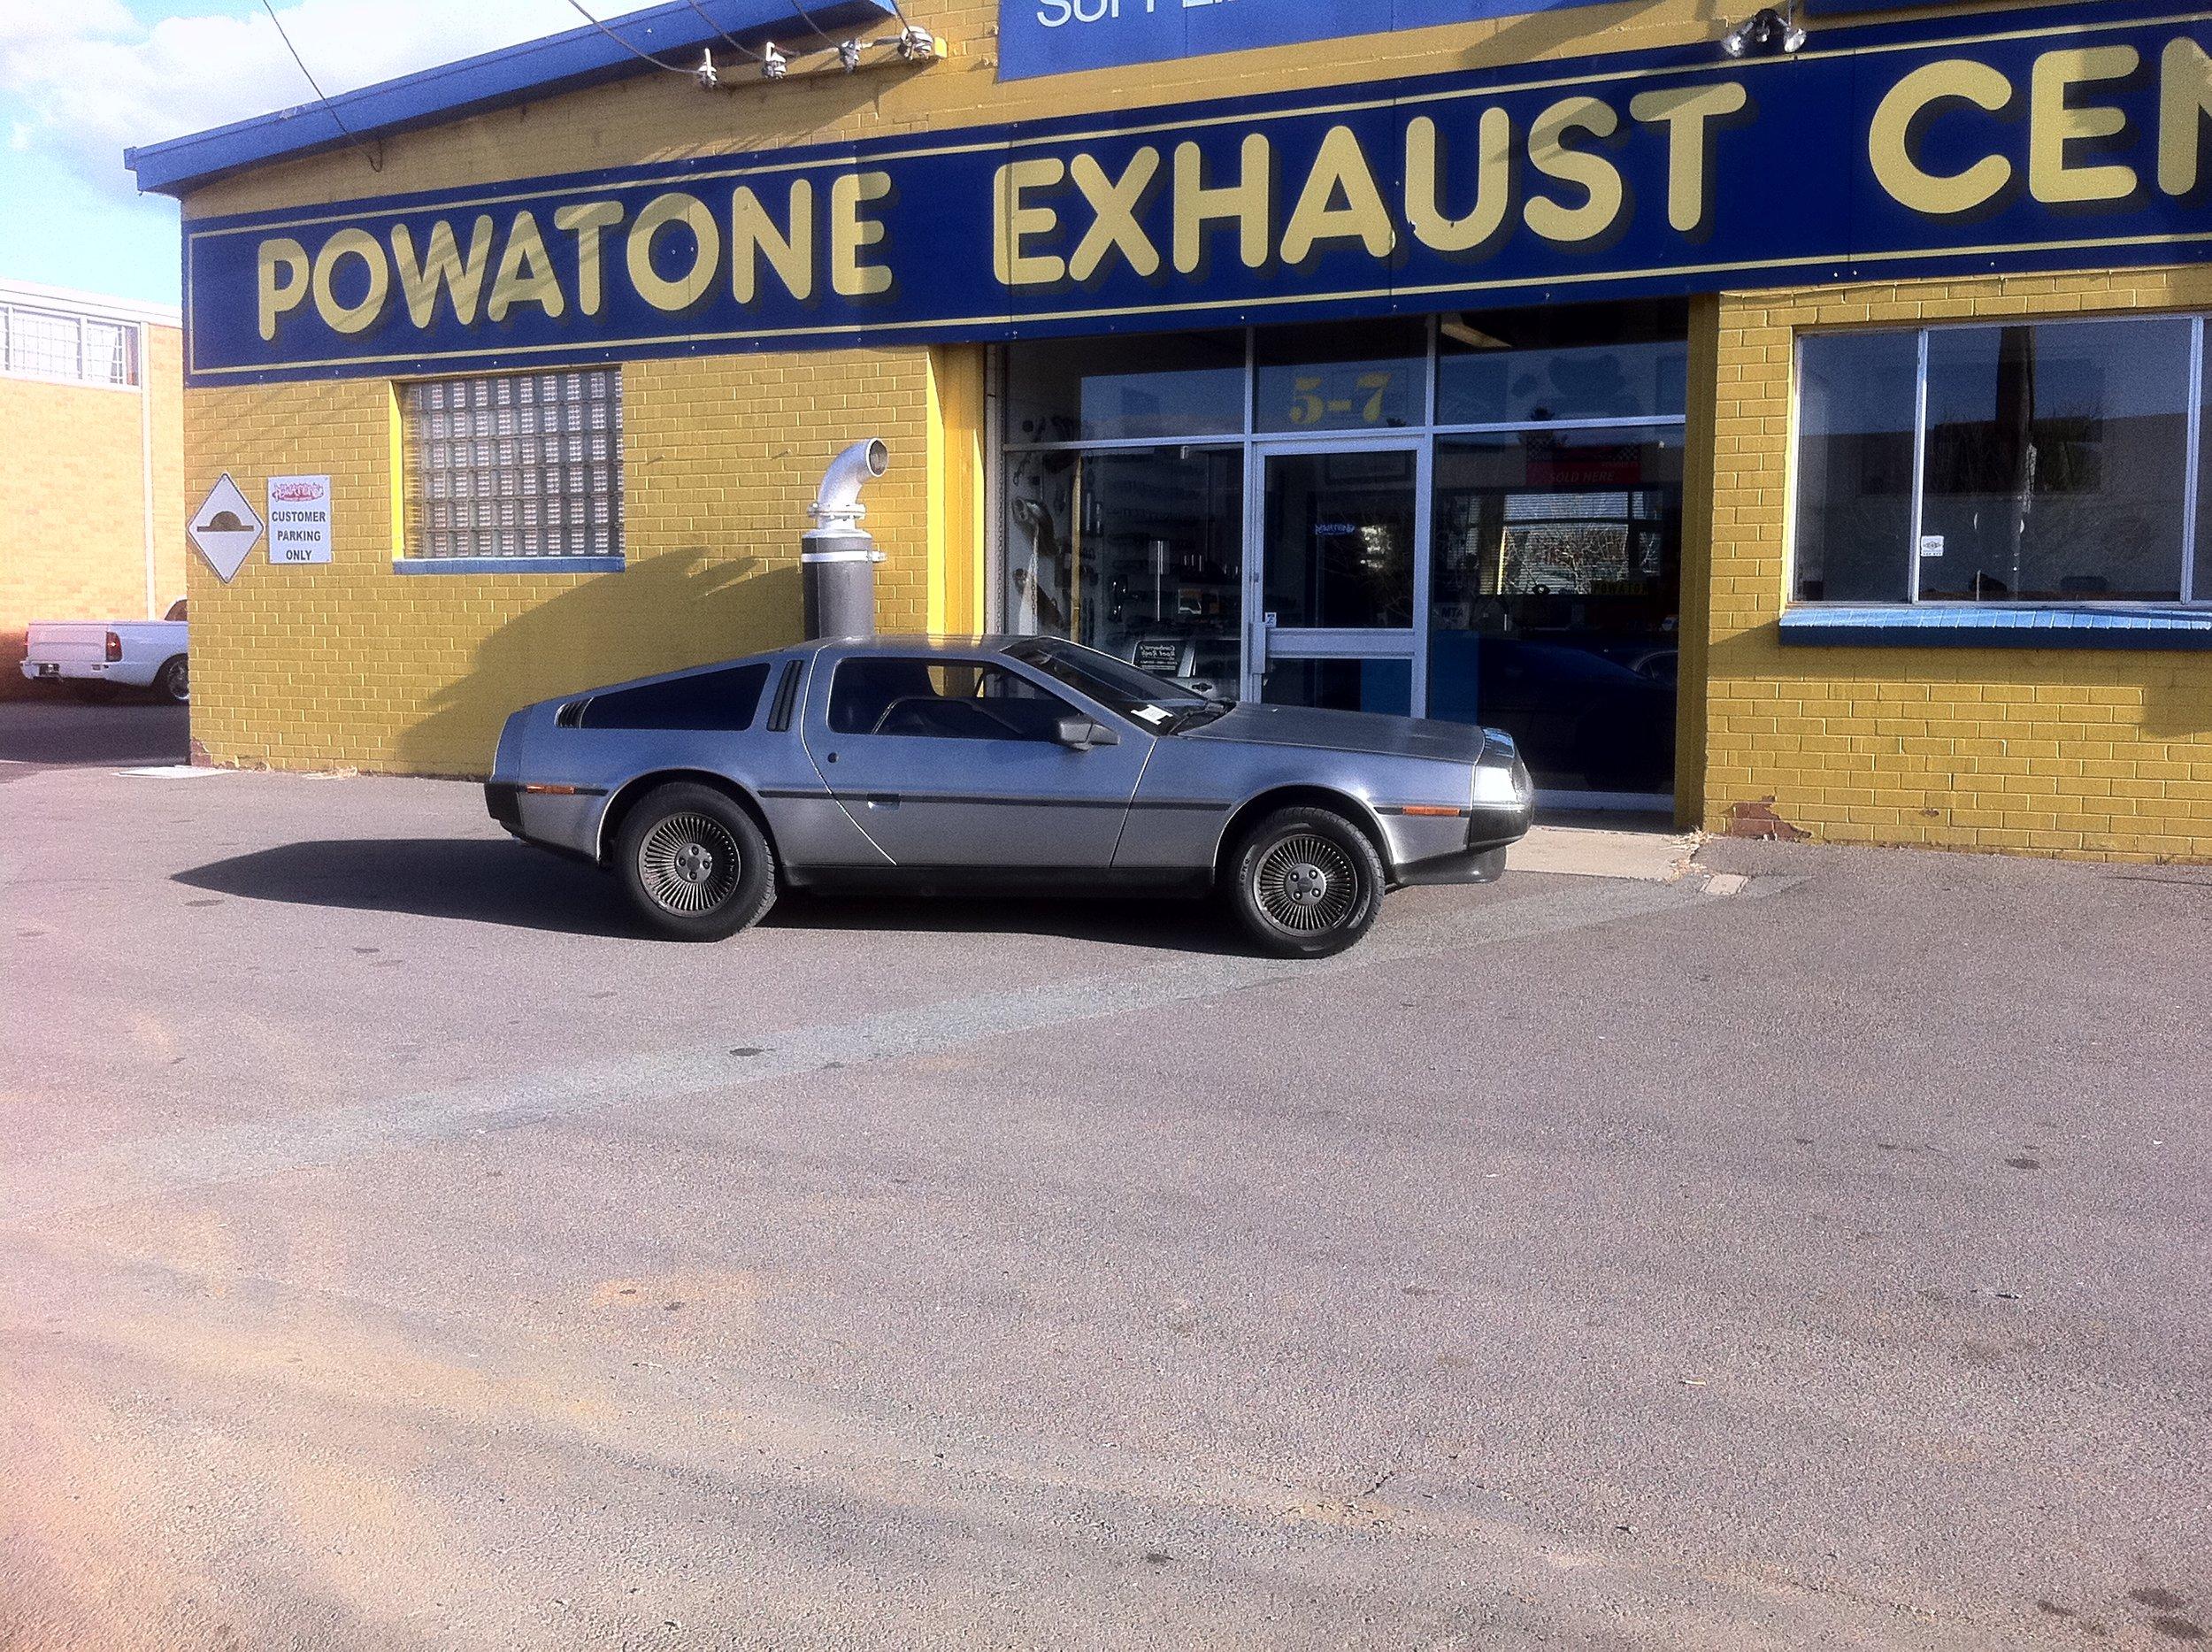 powatone exhaust centre old workshop collie st (2).jpg